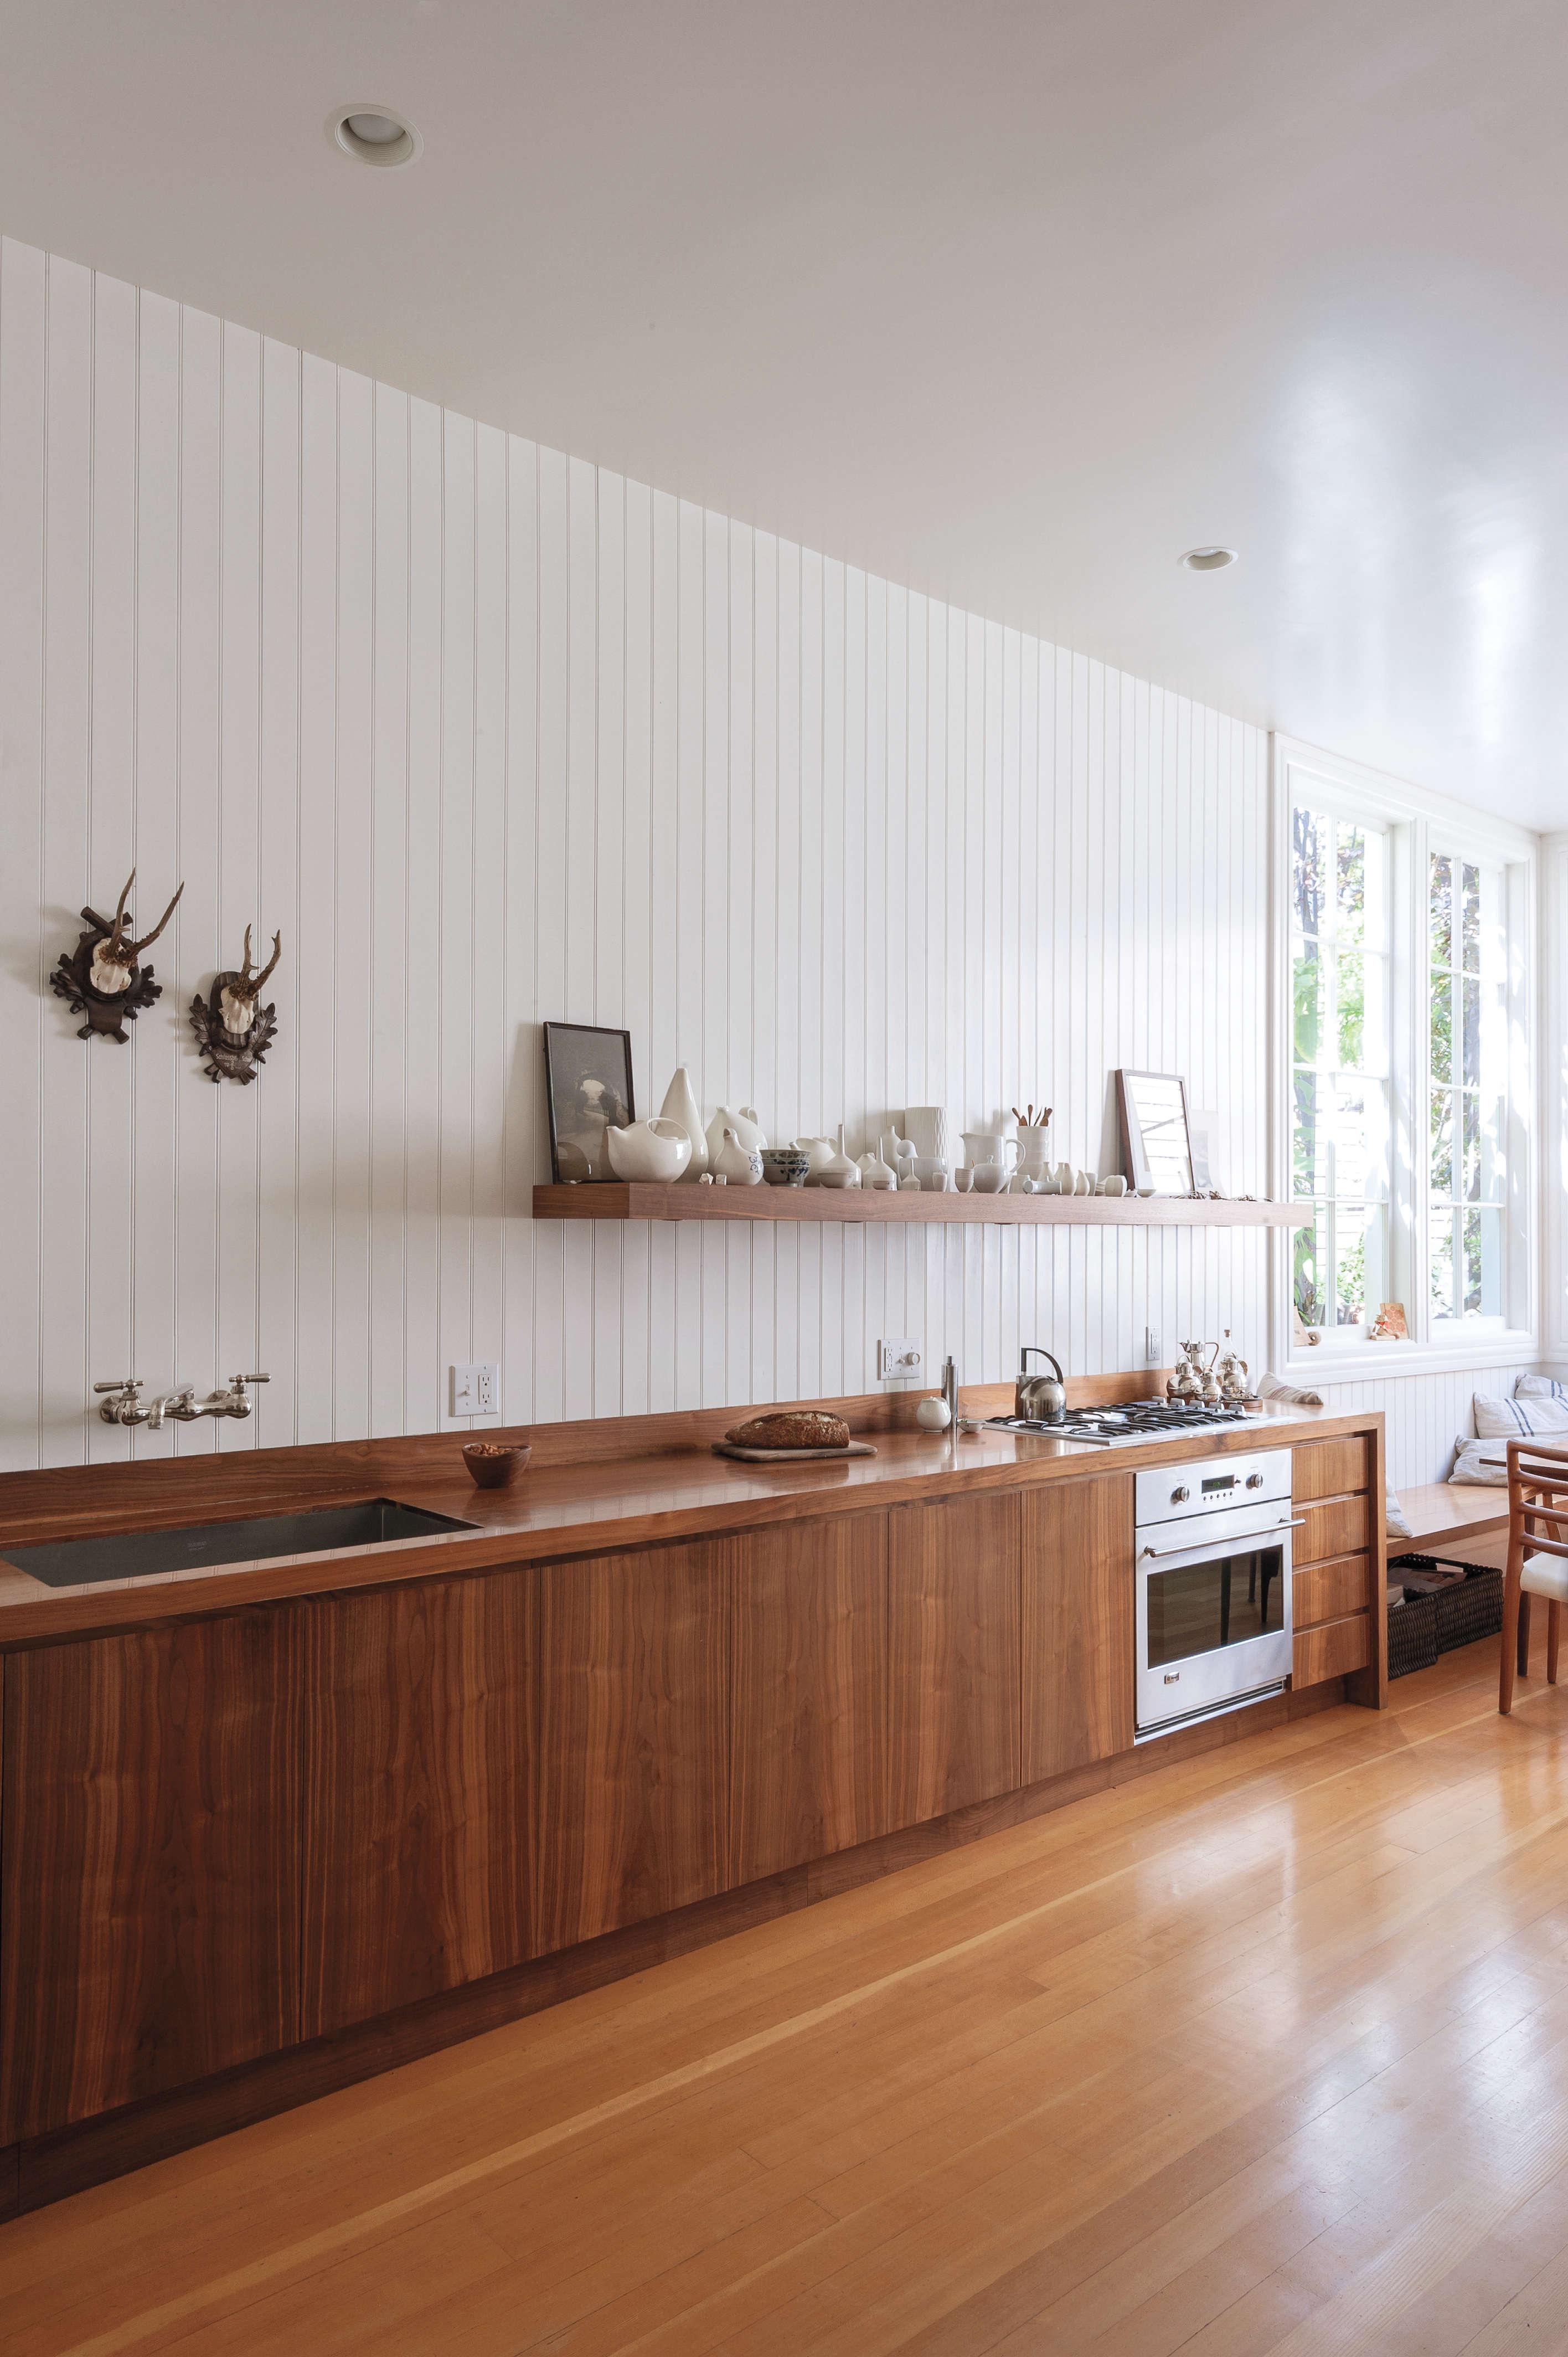 dagmar daley kitchen for remodelista book 9